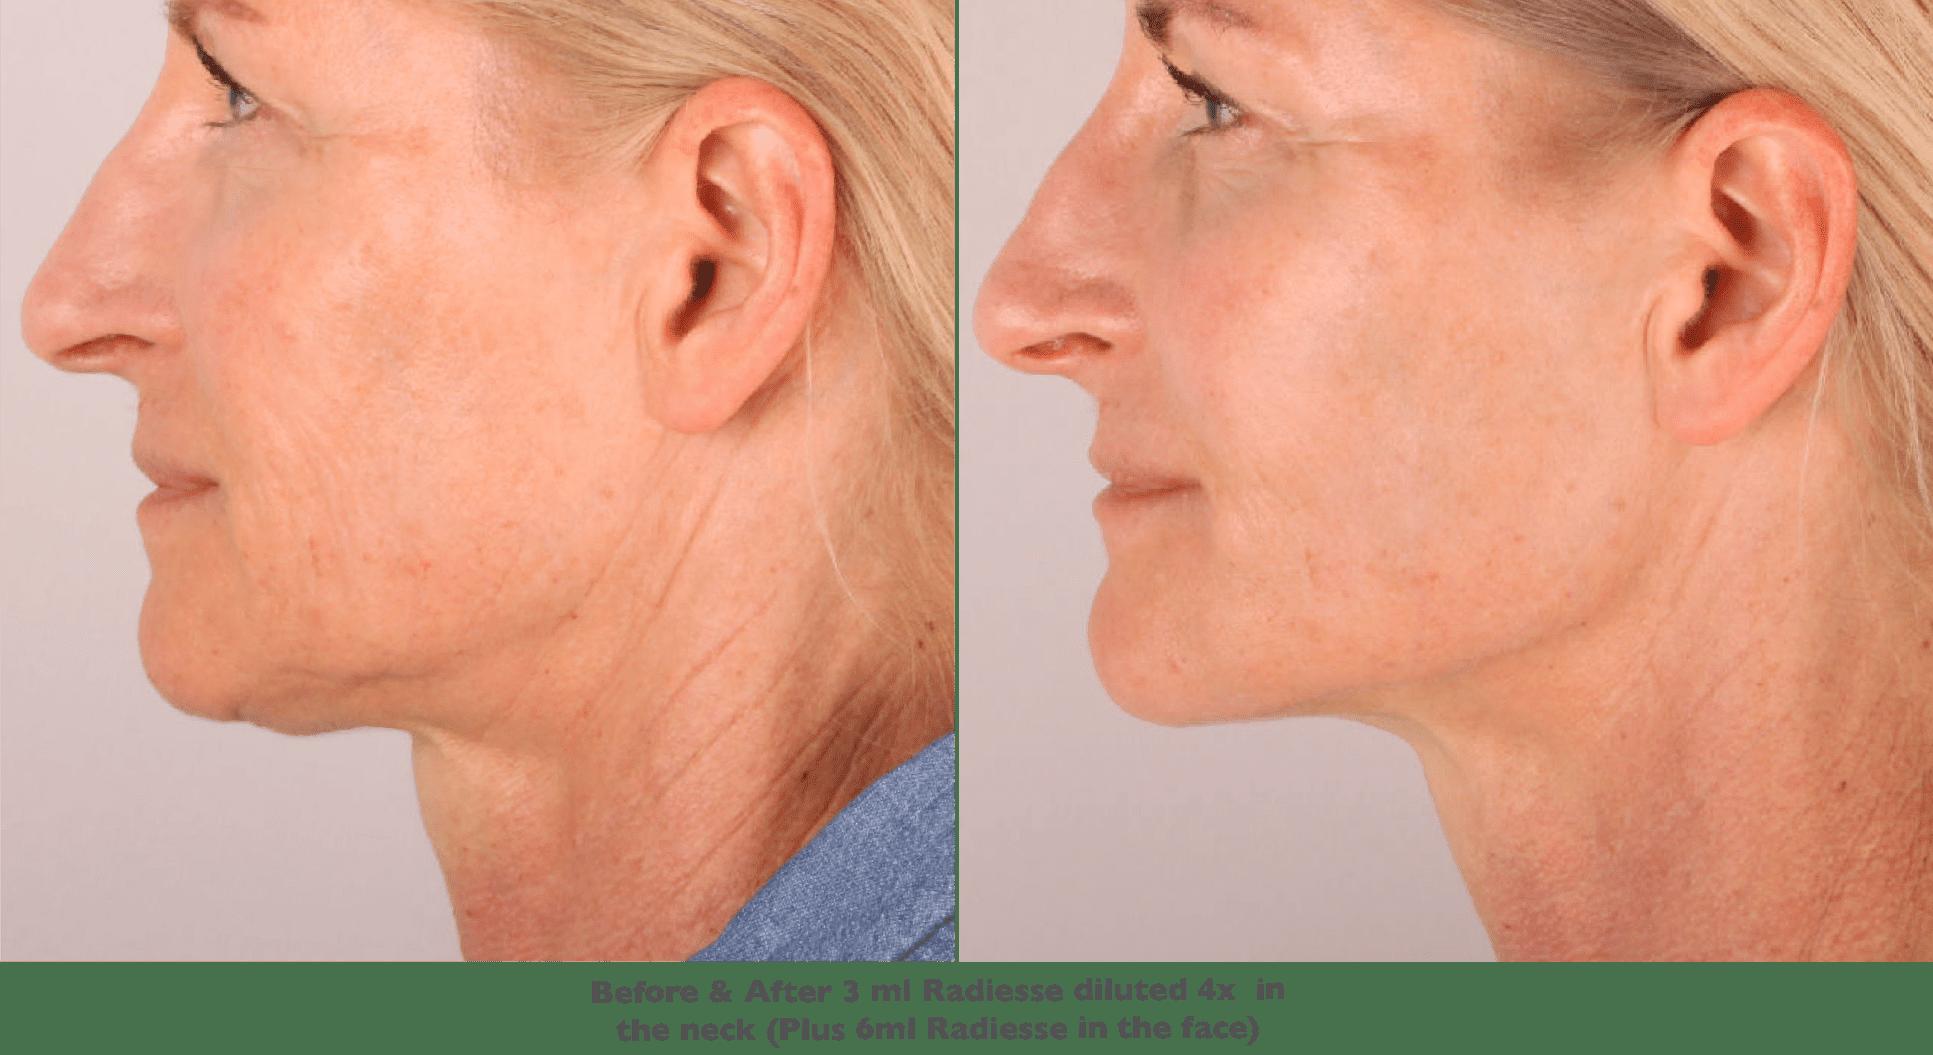 Neck Washing: A Guide to the Neck Rejuvenation Treatment | POPSUGAR Beauty UK